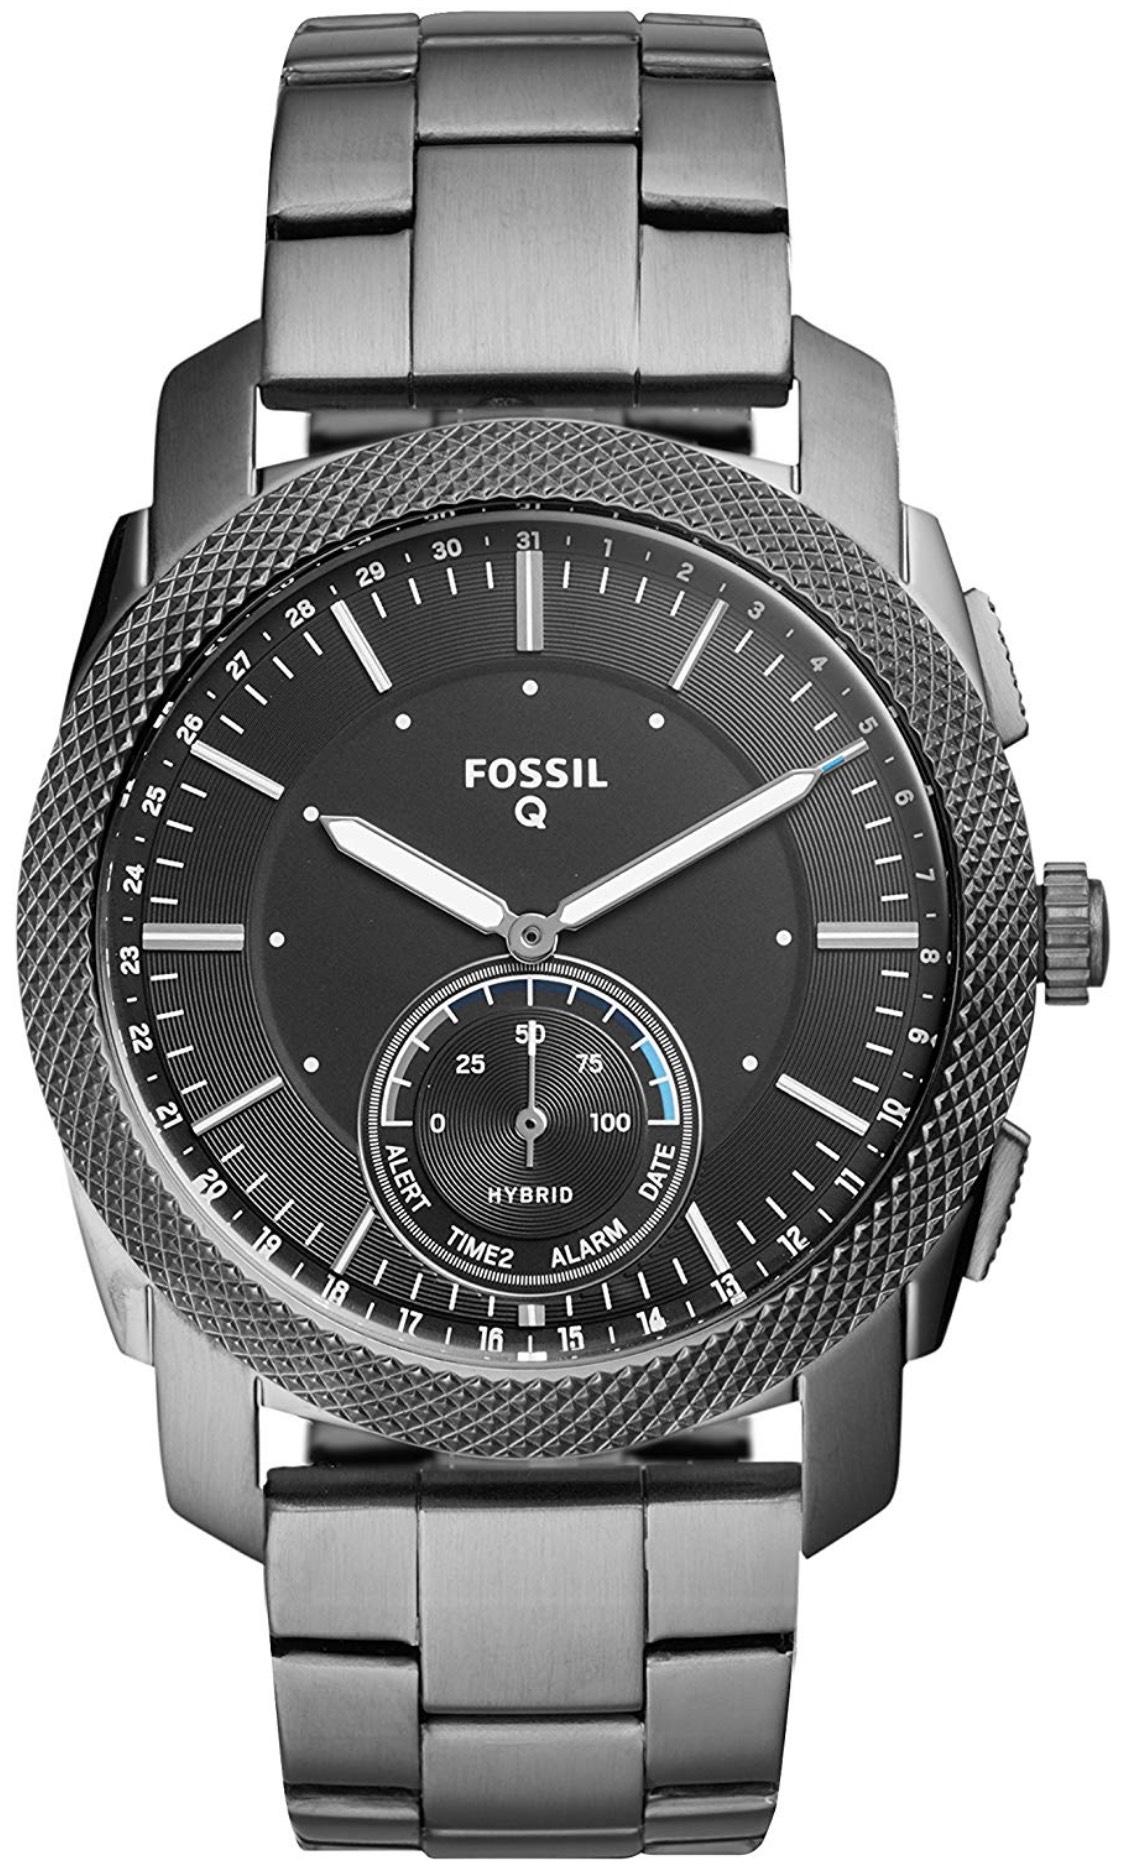 Fossil Q Hybrid Smart Watch FTW1166 £84.49 w/code @ Amazon